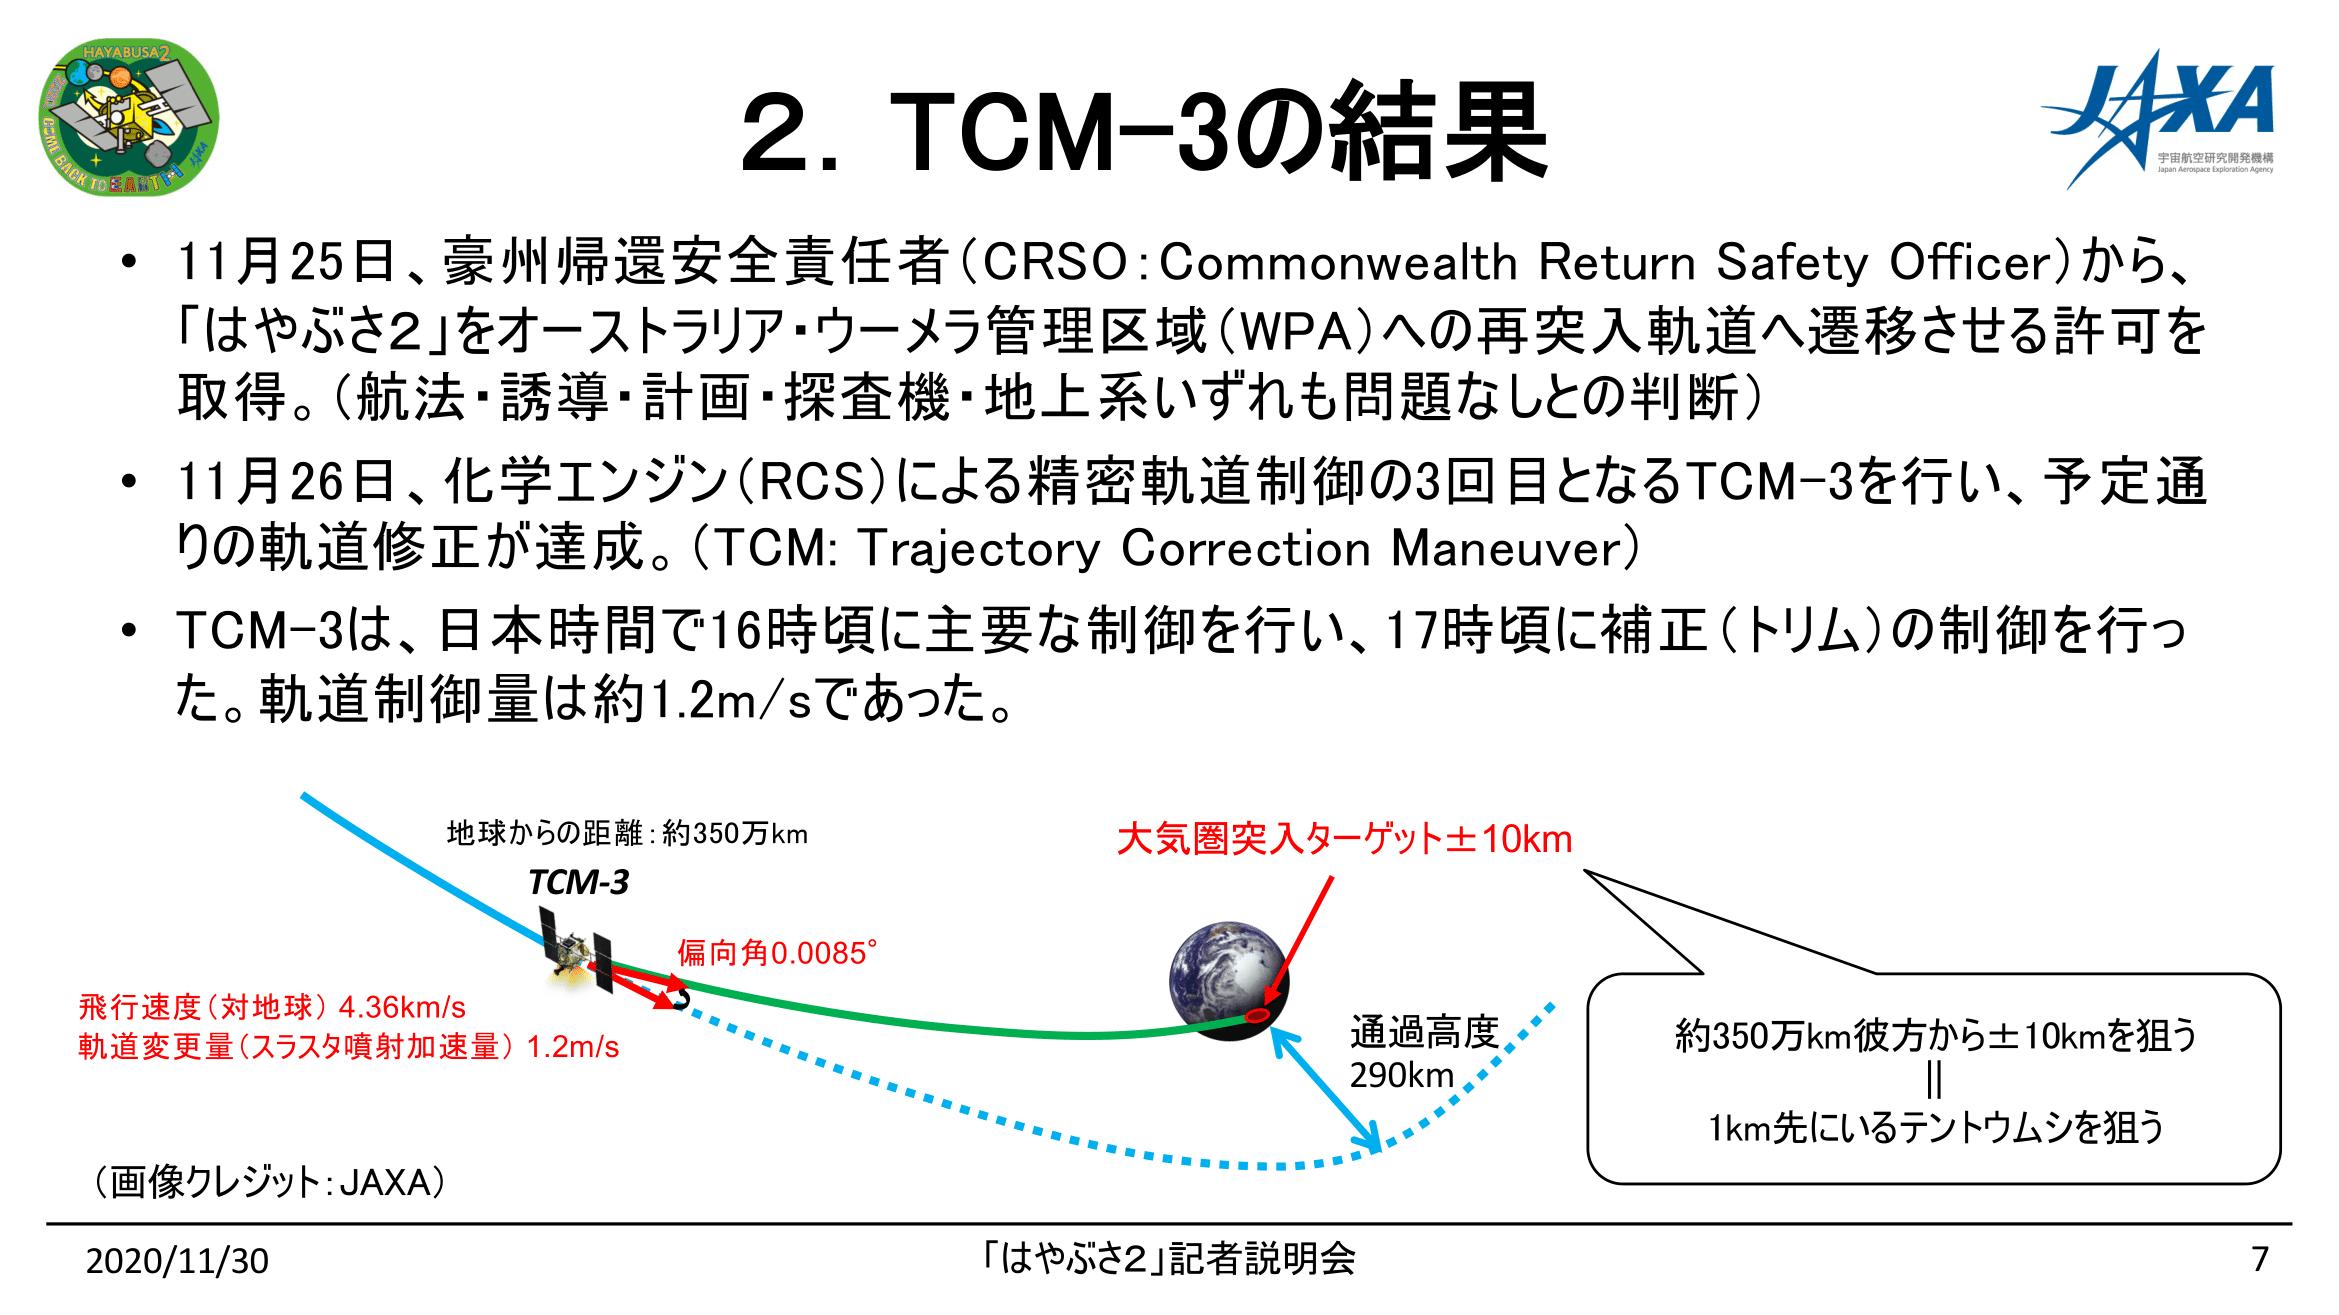 f:id:Imamura:20201130154009p:plain